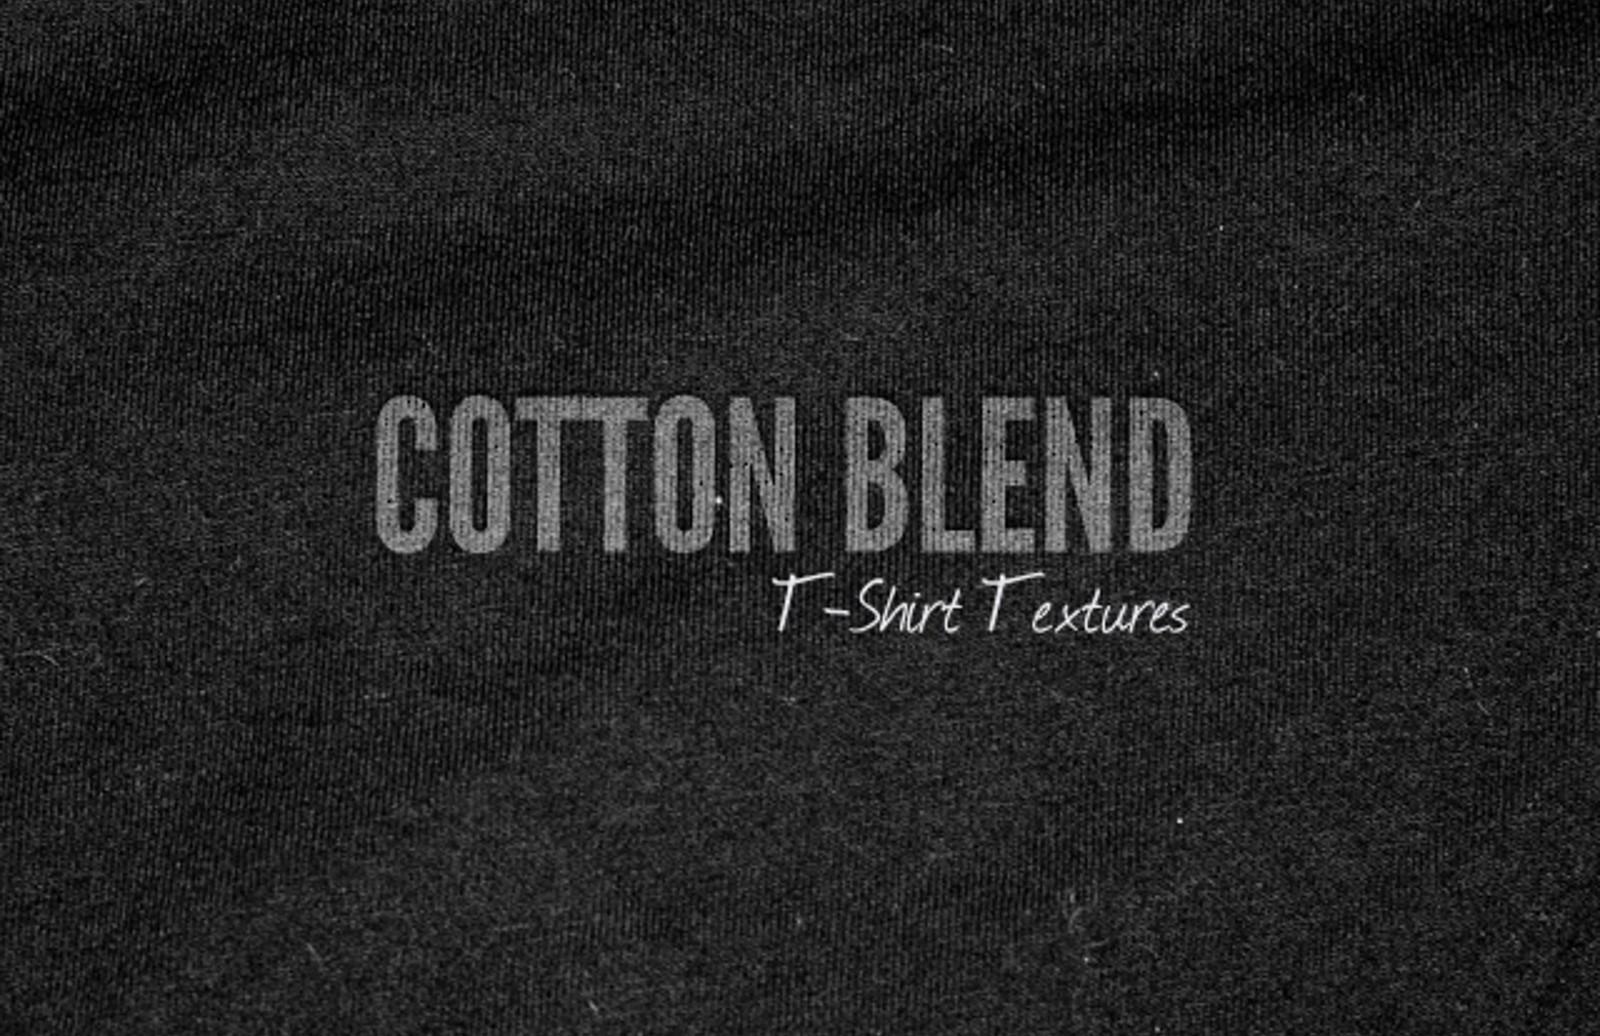 Cottonpreview1